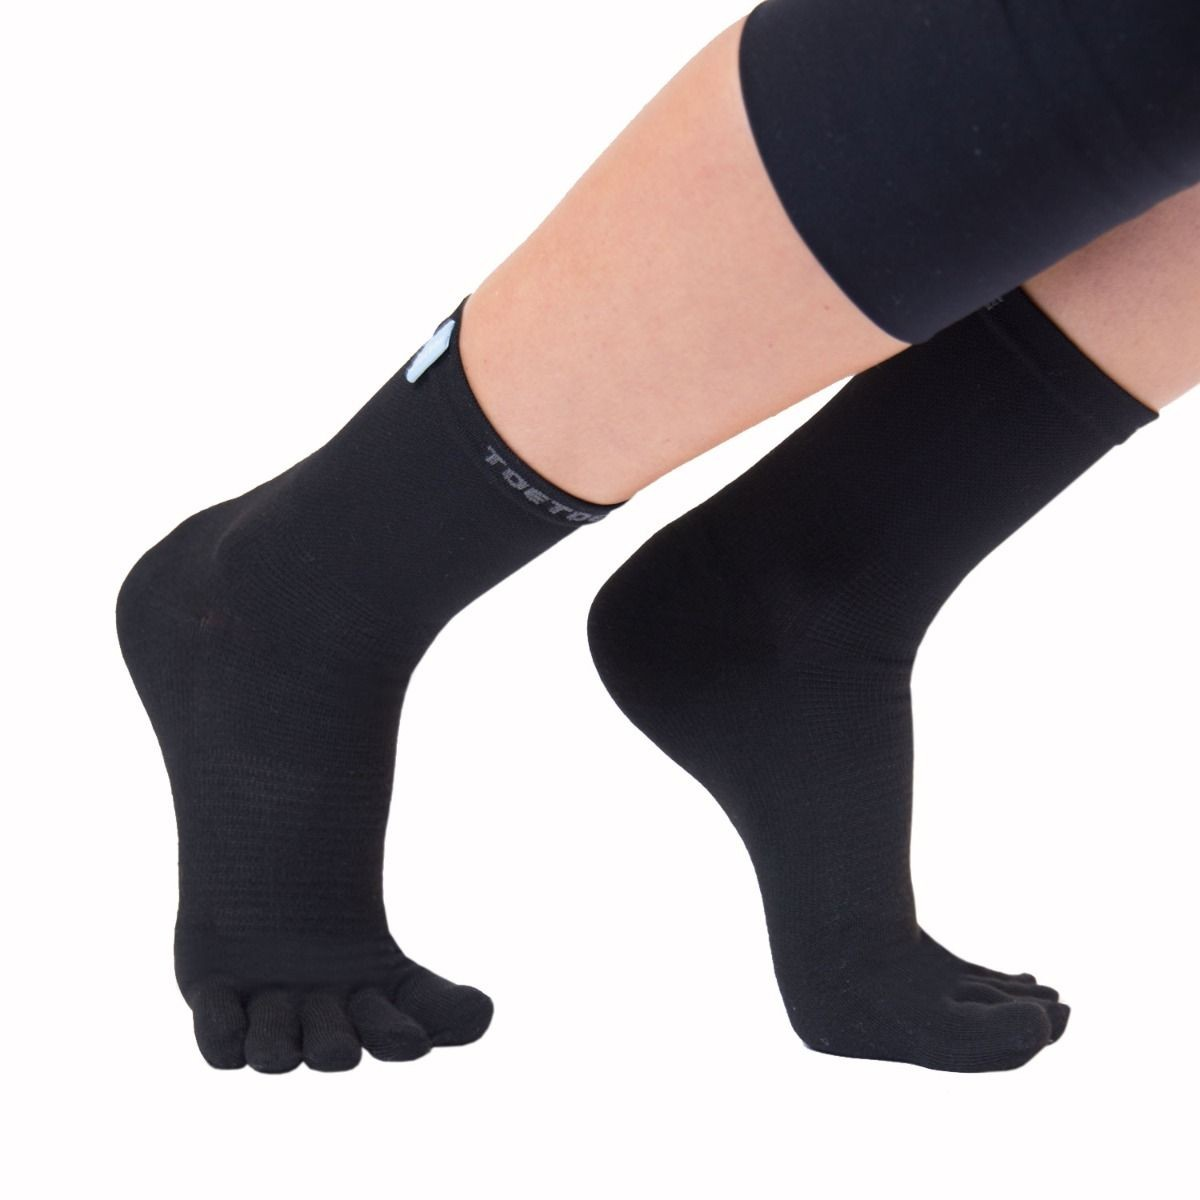 Chaussettes Outdoor à 5 doigts (Coolmax)